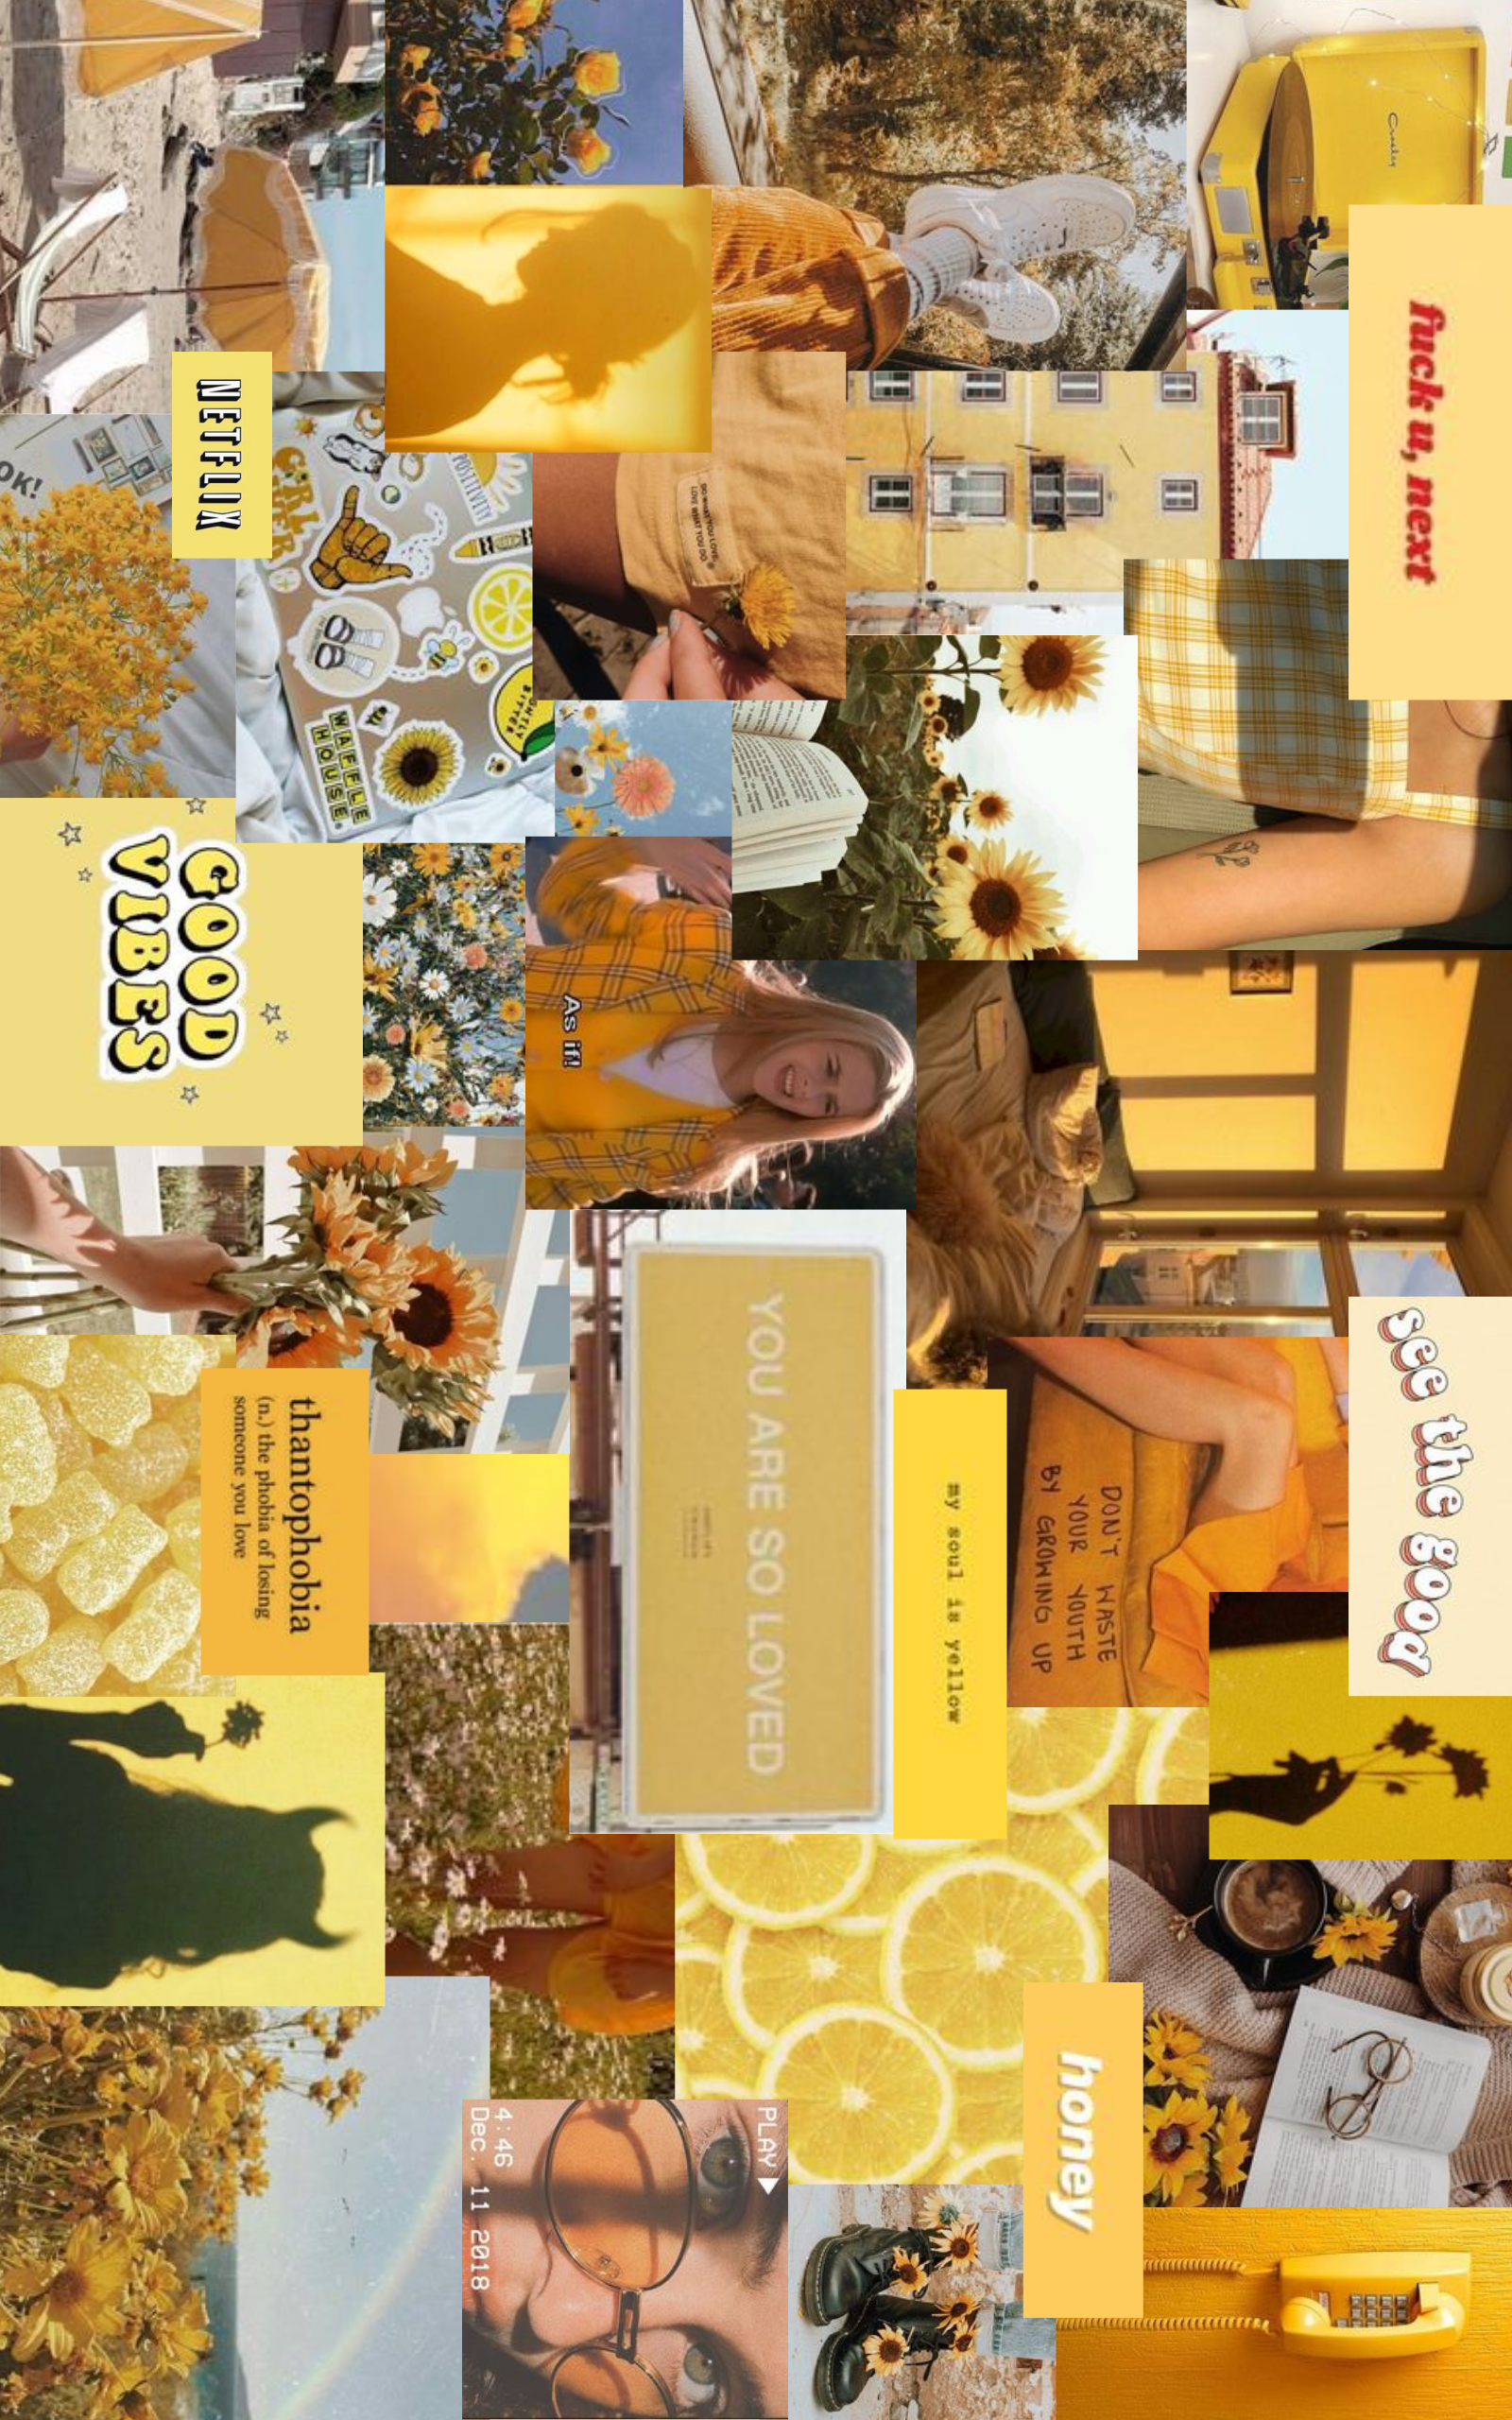 Yellow Aesthetic Desktop Wallpaper Aesthetic Desktop Wallpaper Cute Desktop Wallpaper Iphone Wallpaper Yellow